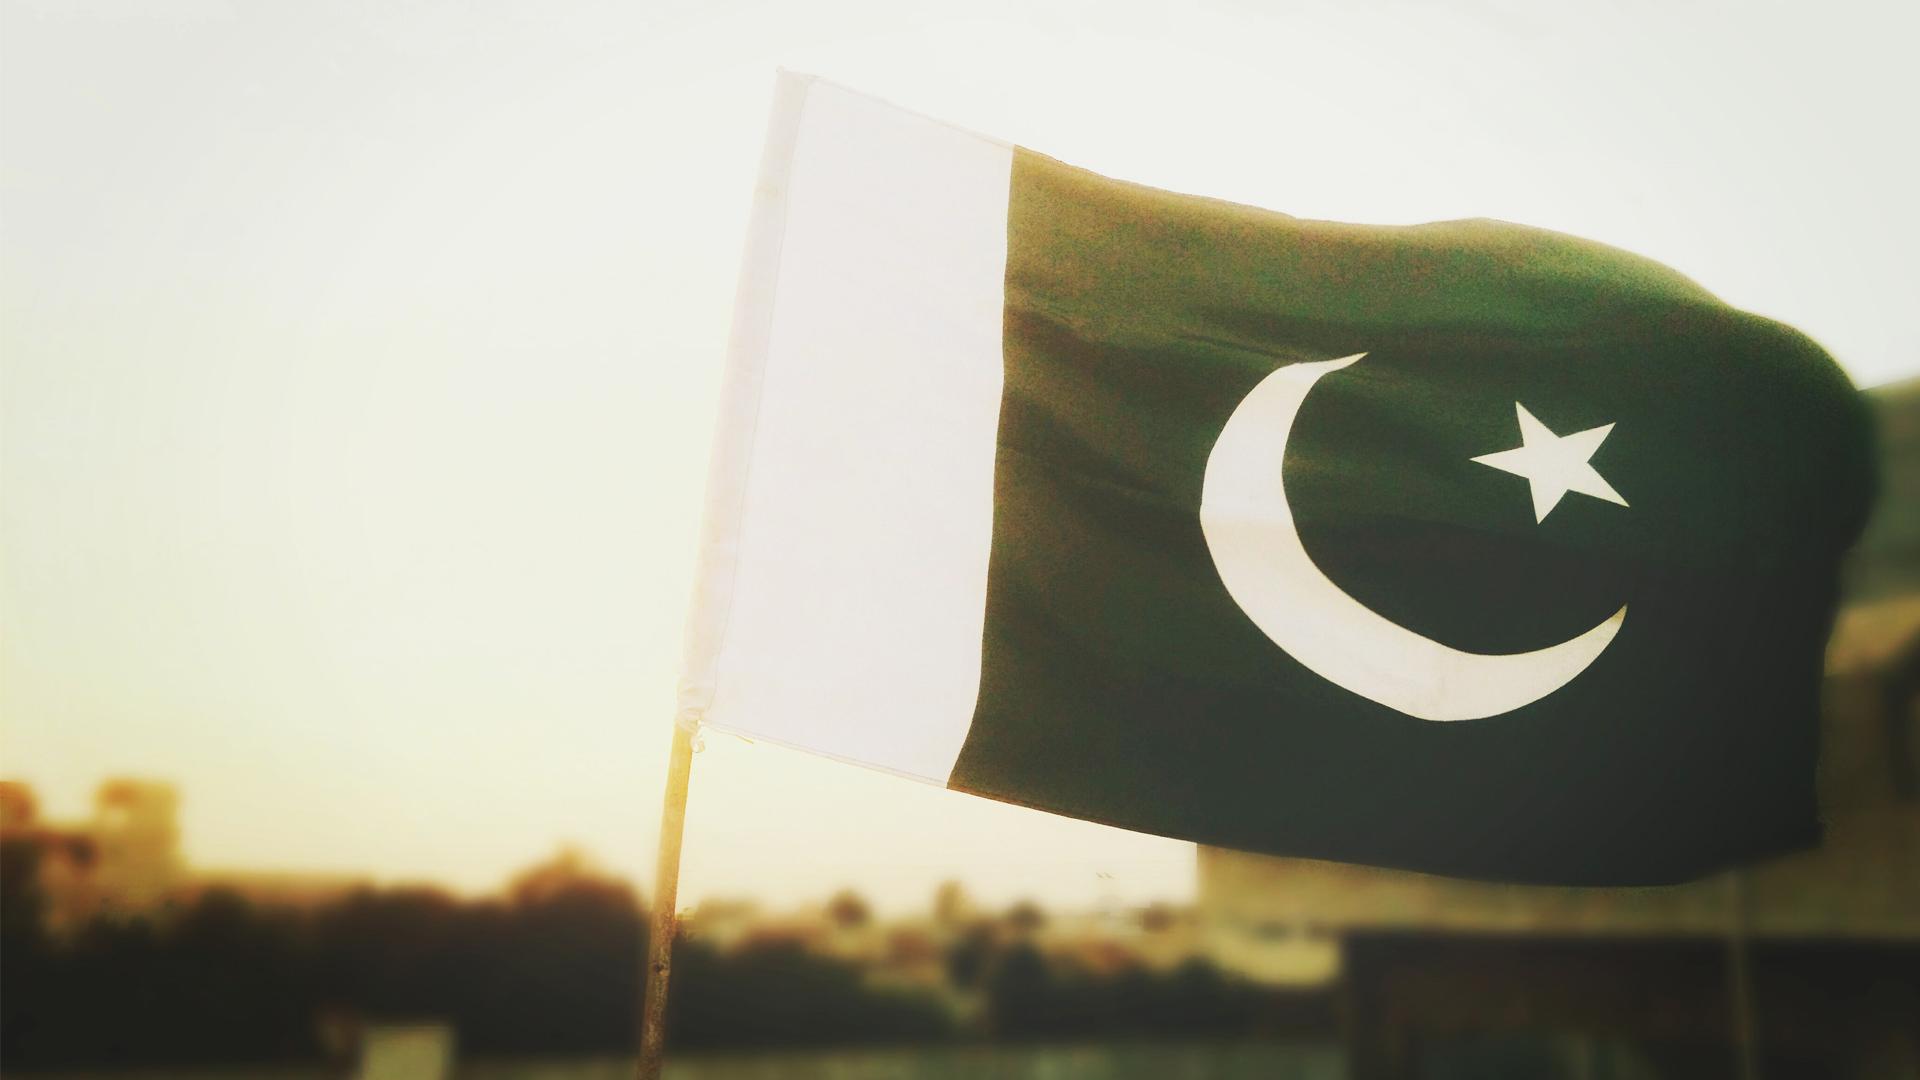 Prophet Cartoons: Pakistan Parliament To Mull Expelling French Ambassador